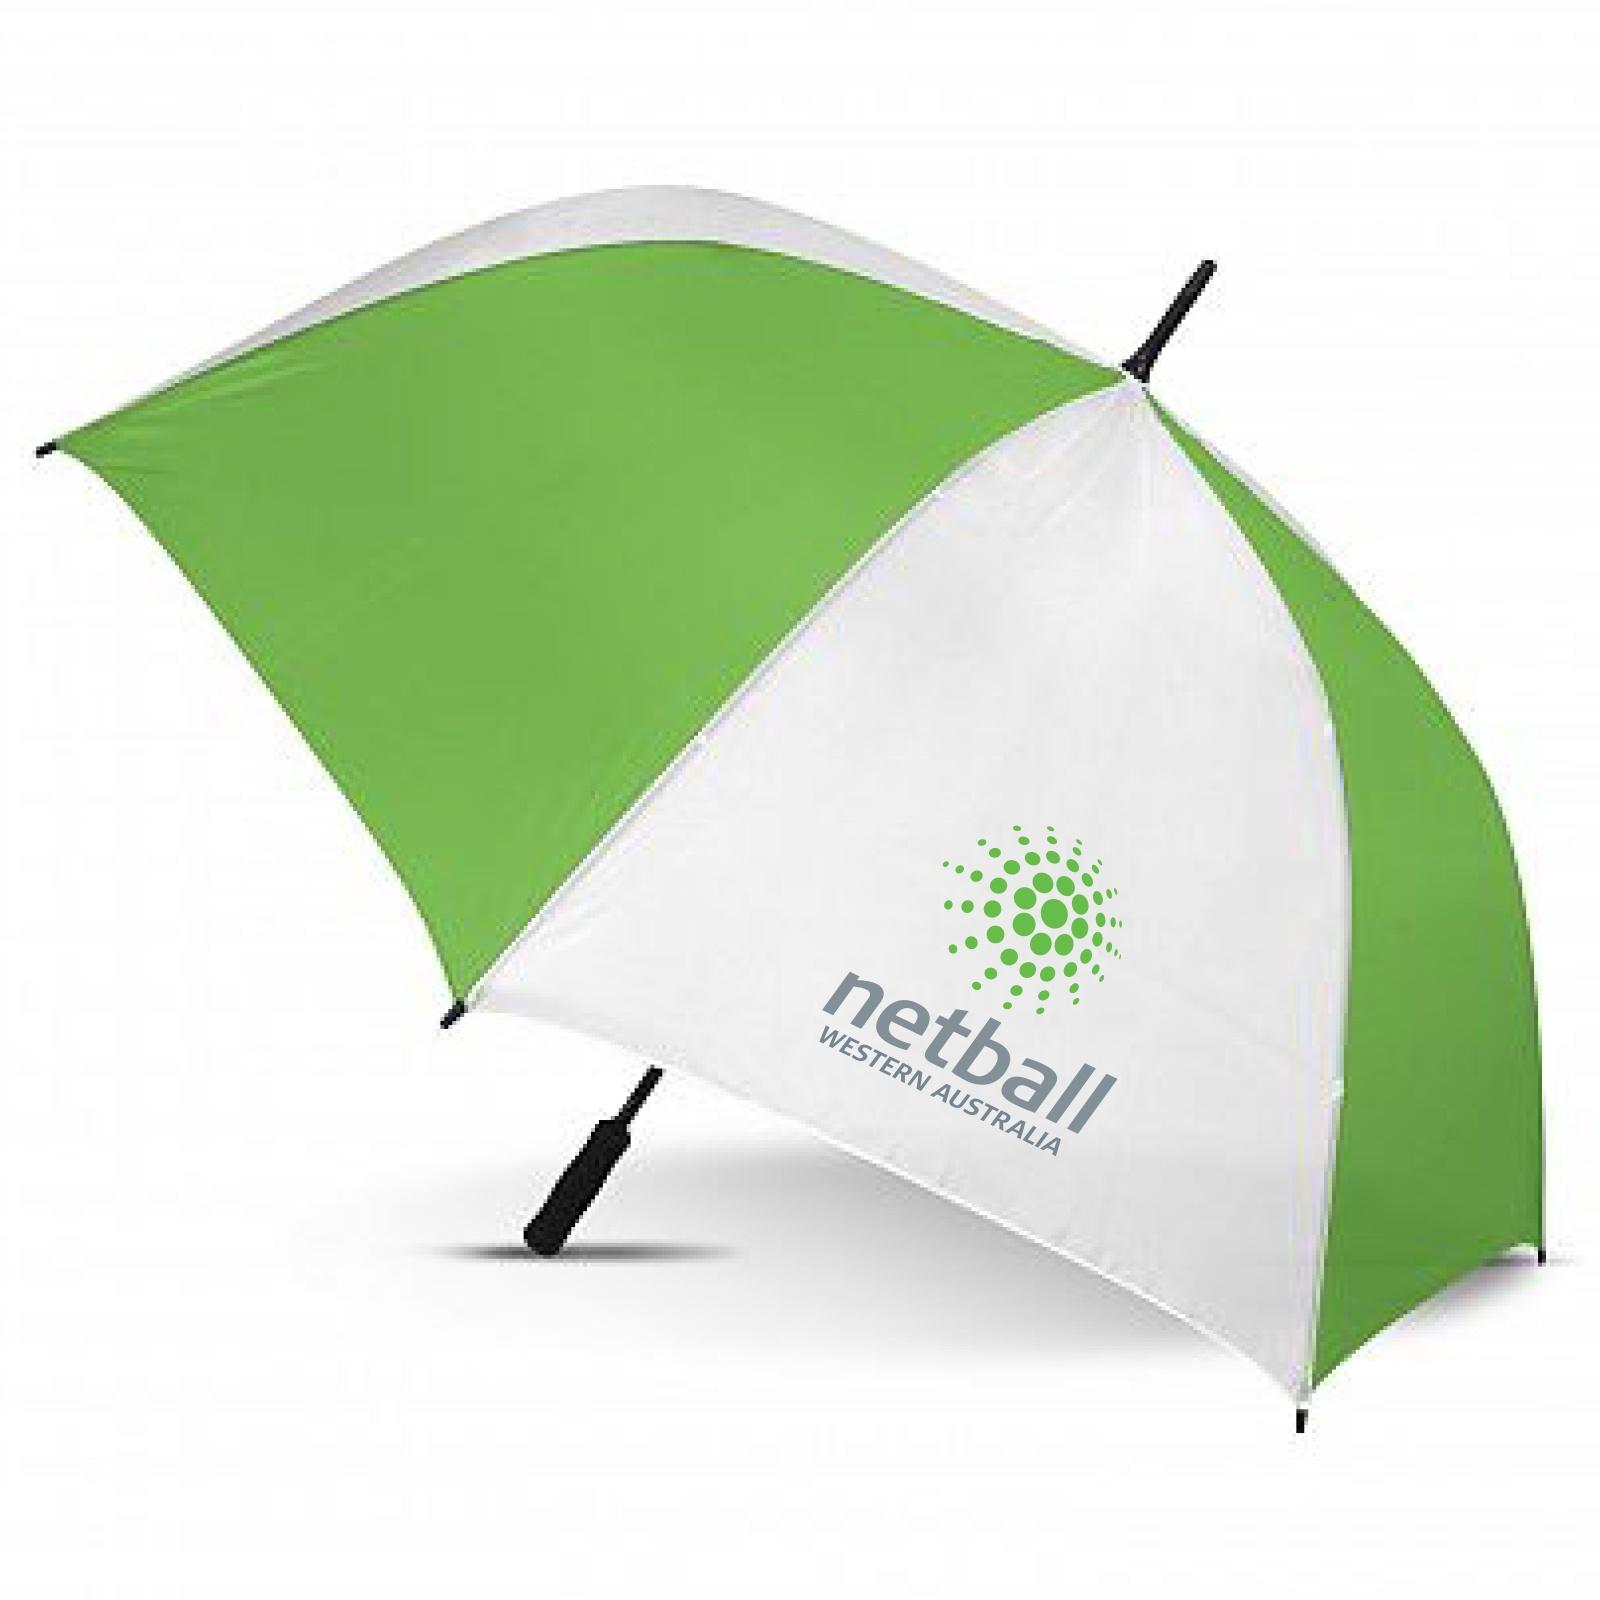 Netball WA Umbrella